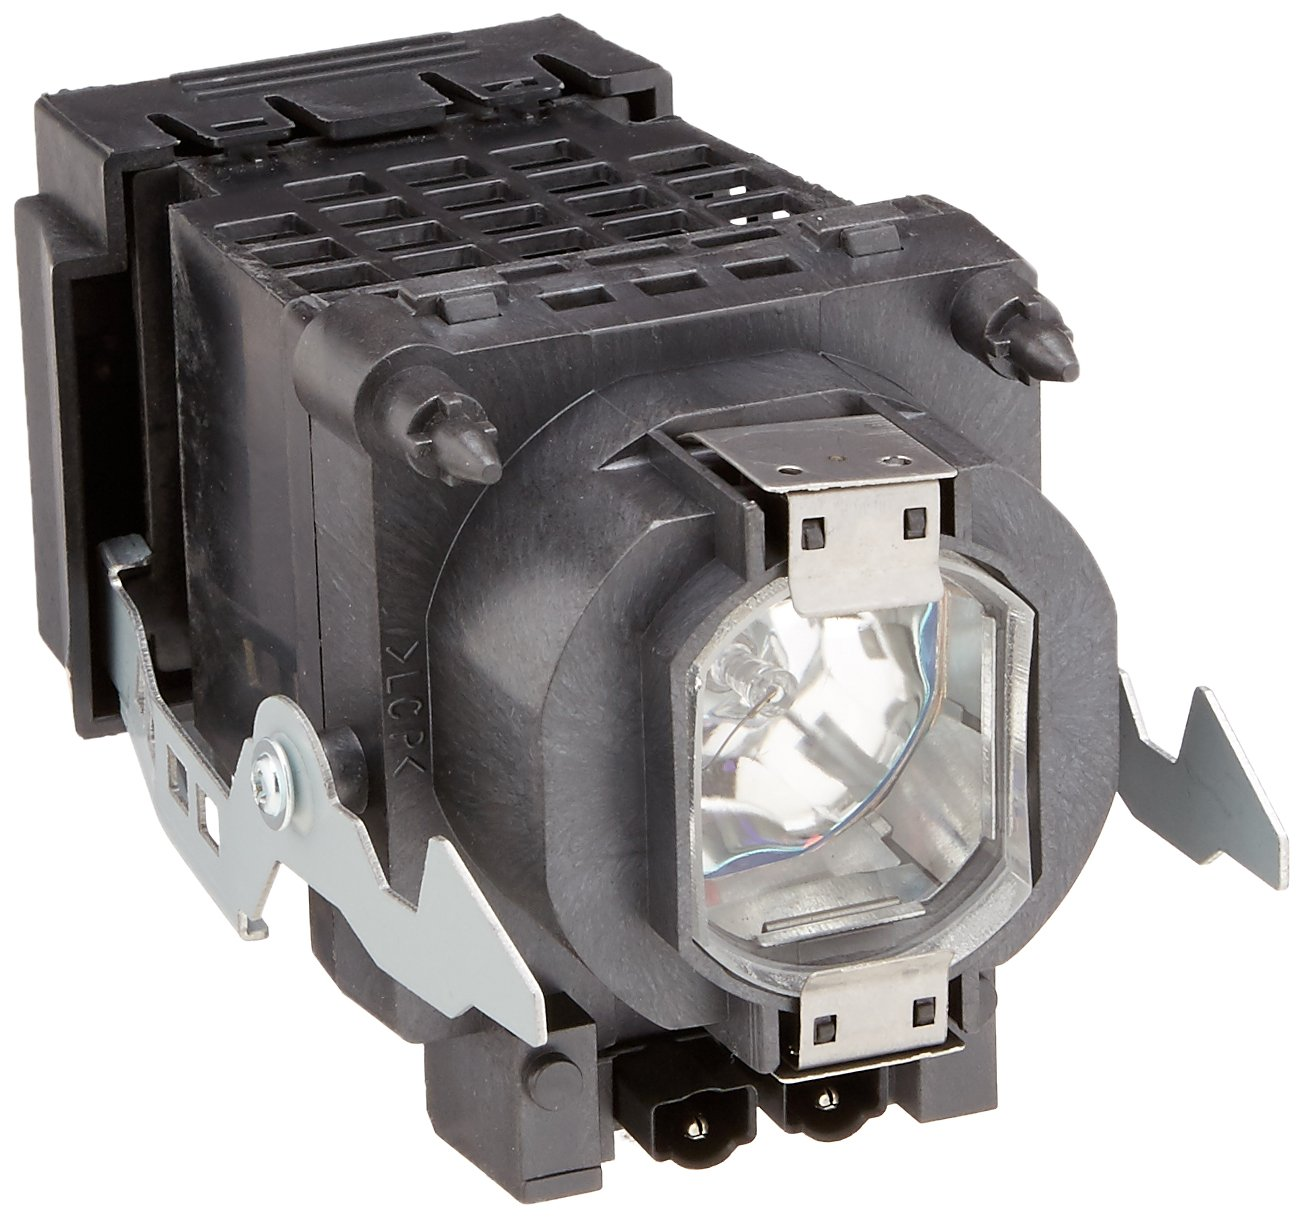 F-9308-750-0 F93087500 XL-2400 XL2400 Philips Original Sony WEGA 3LCD TV Lamp